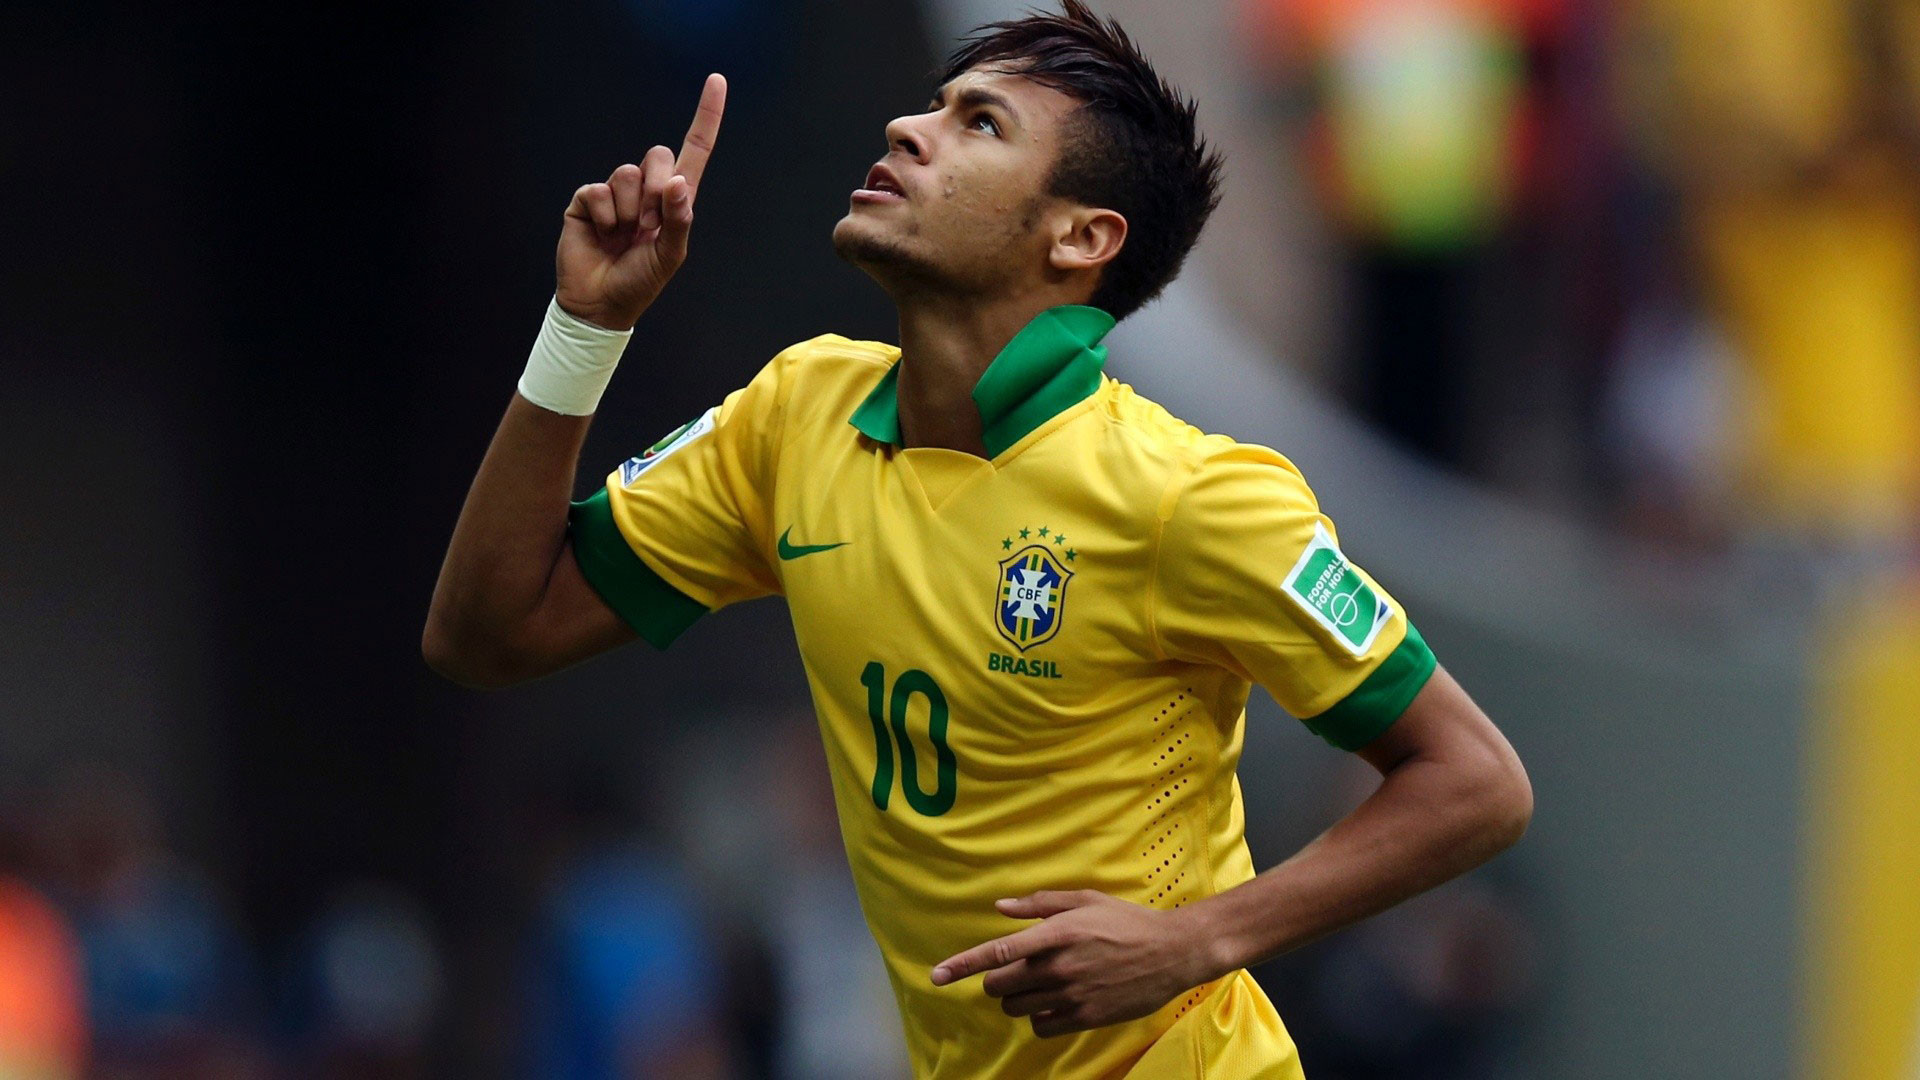 hd pics photos sports neymar brazil football team desktop background  wallpaper